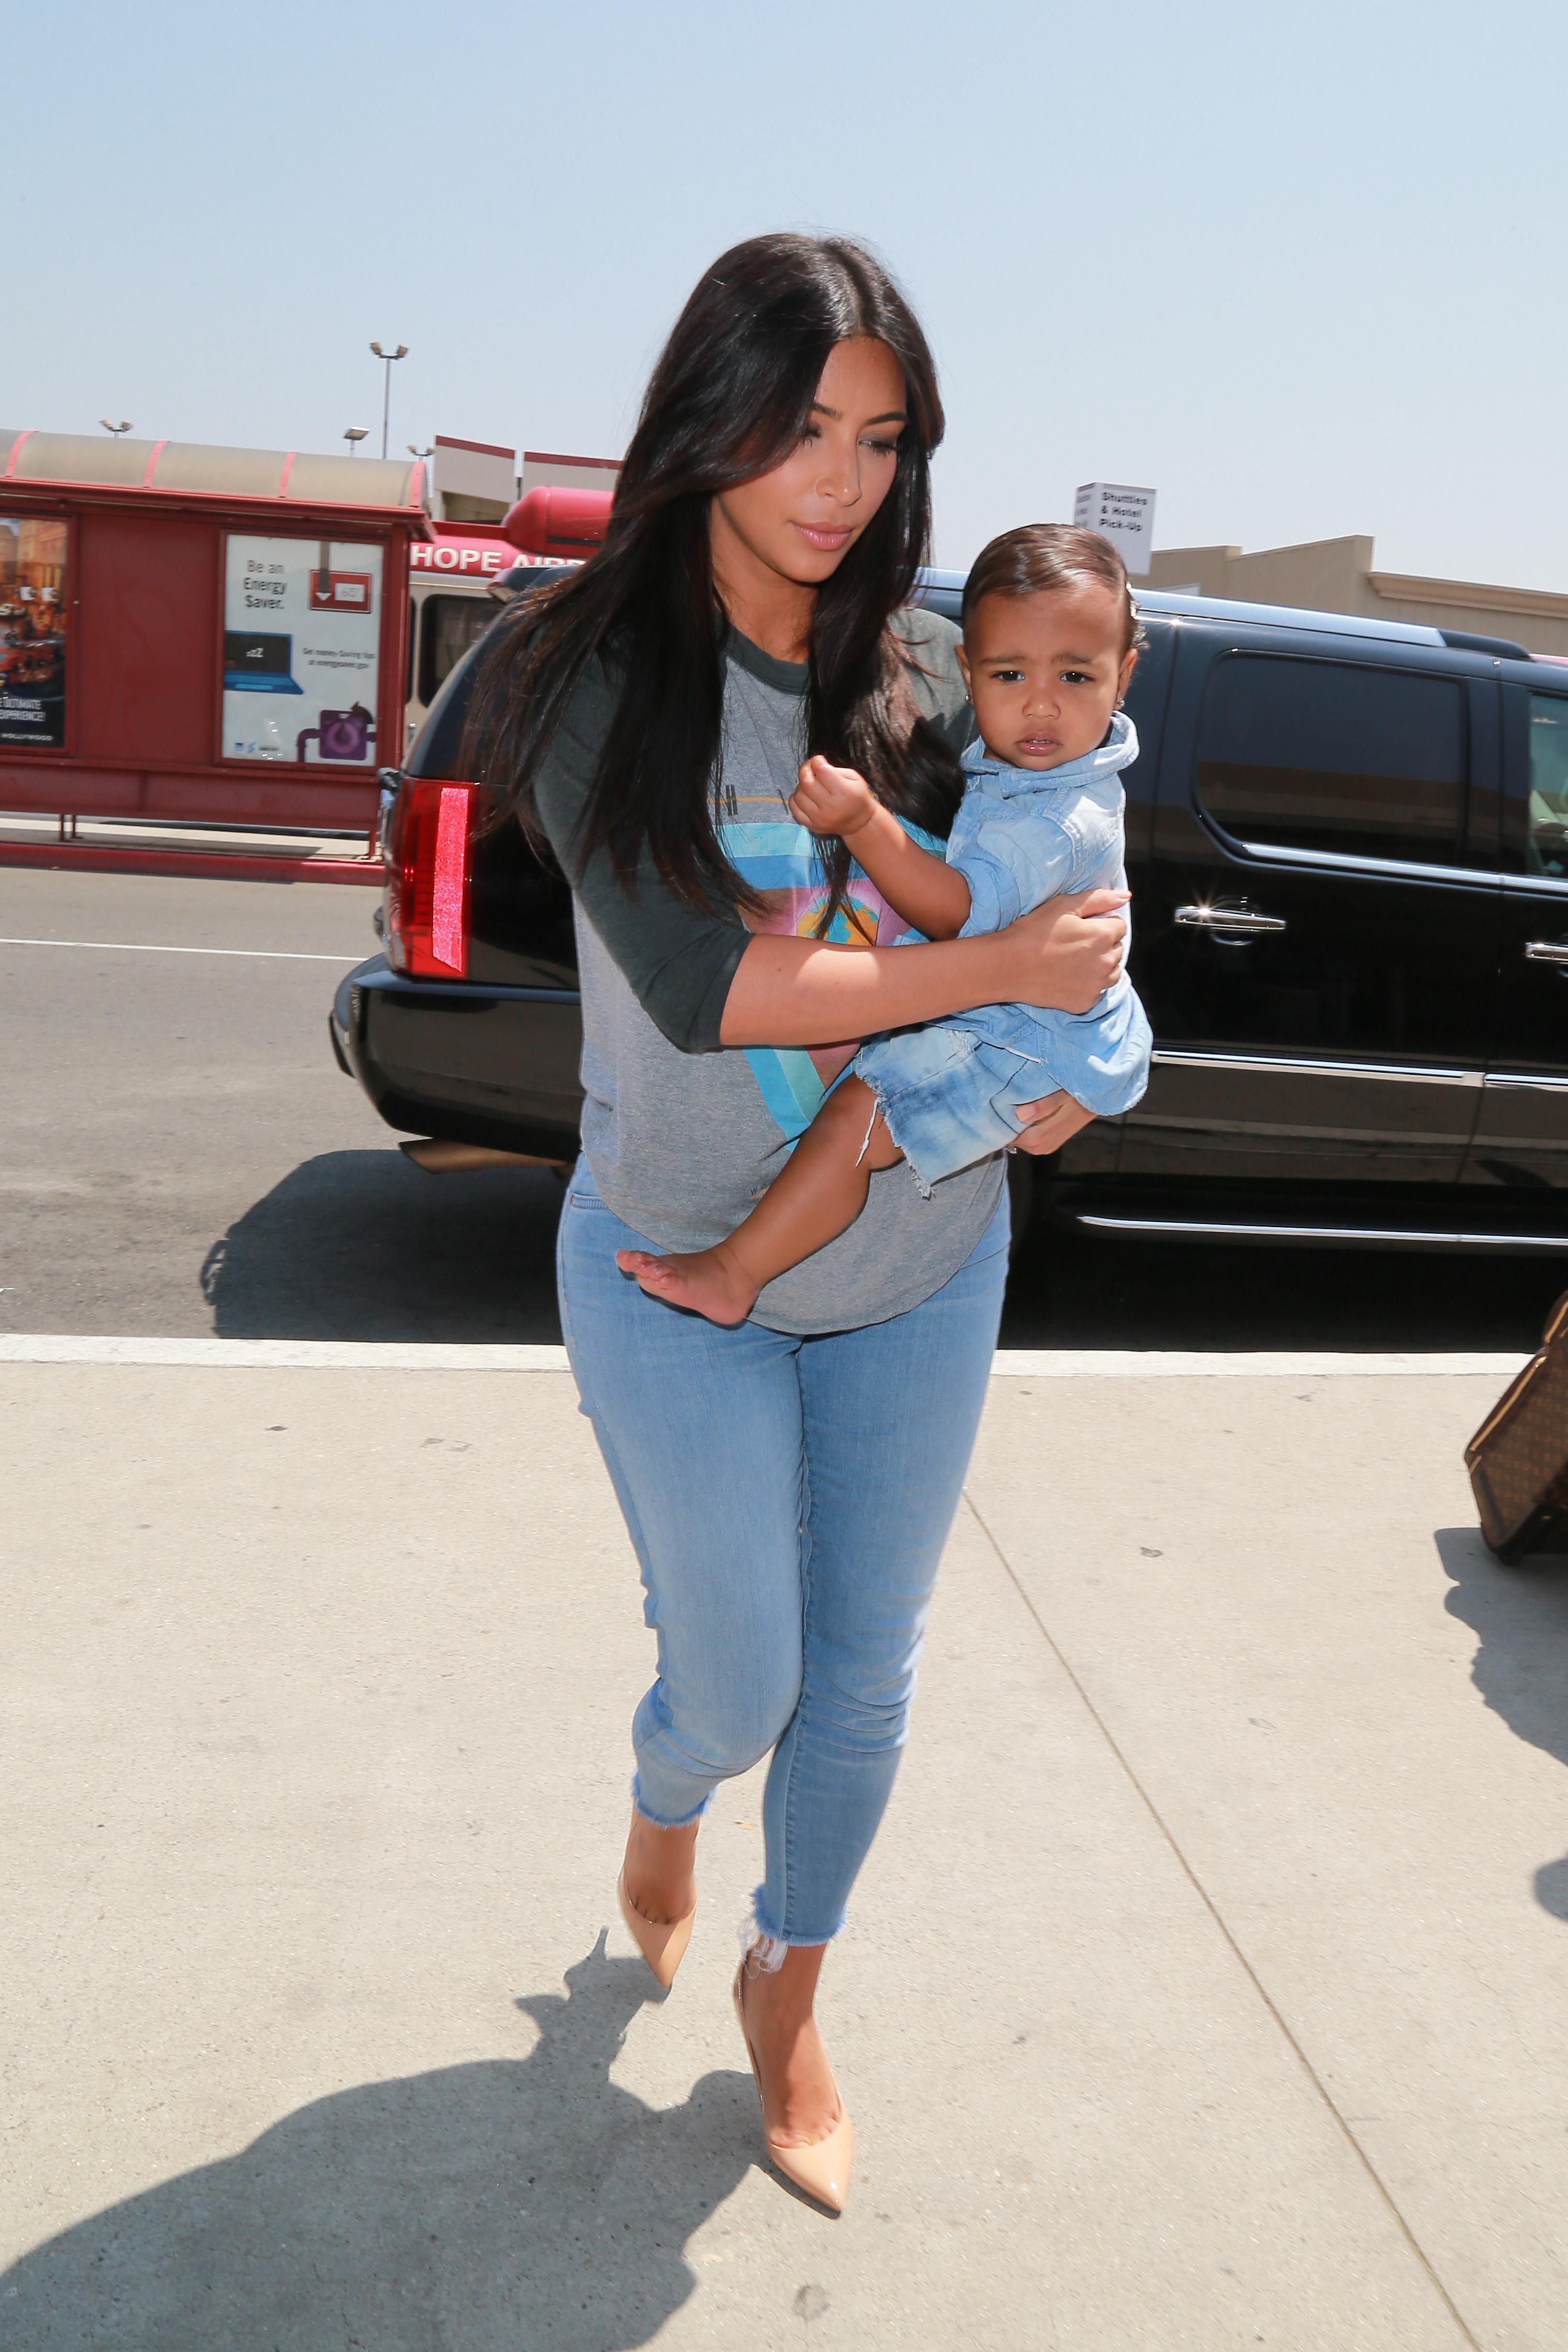 Kim Kardashian with her baby North